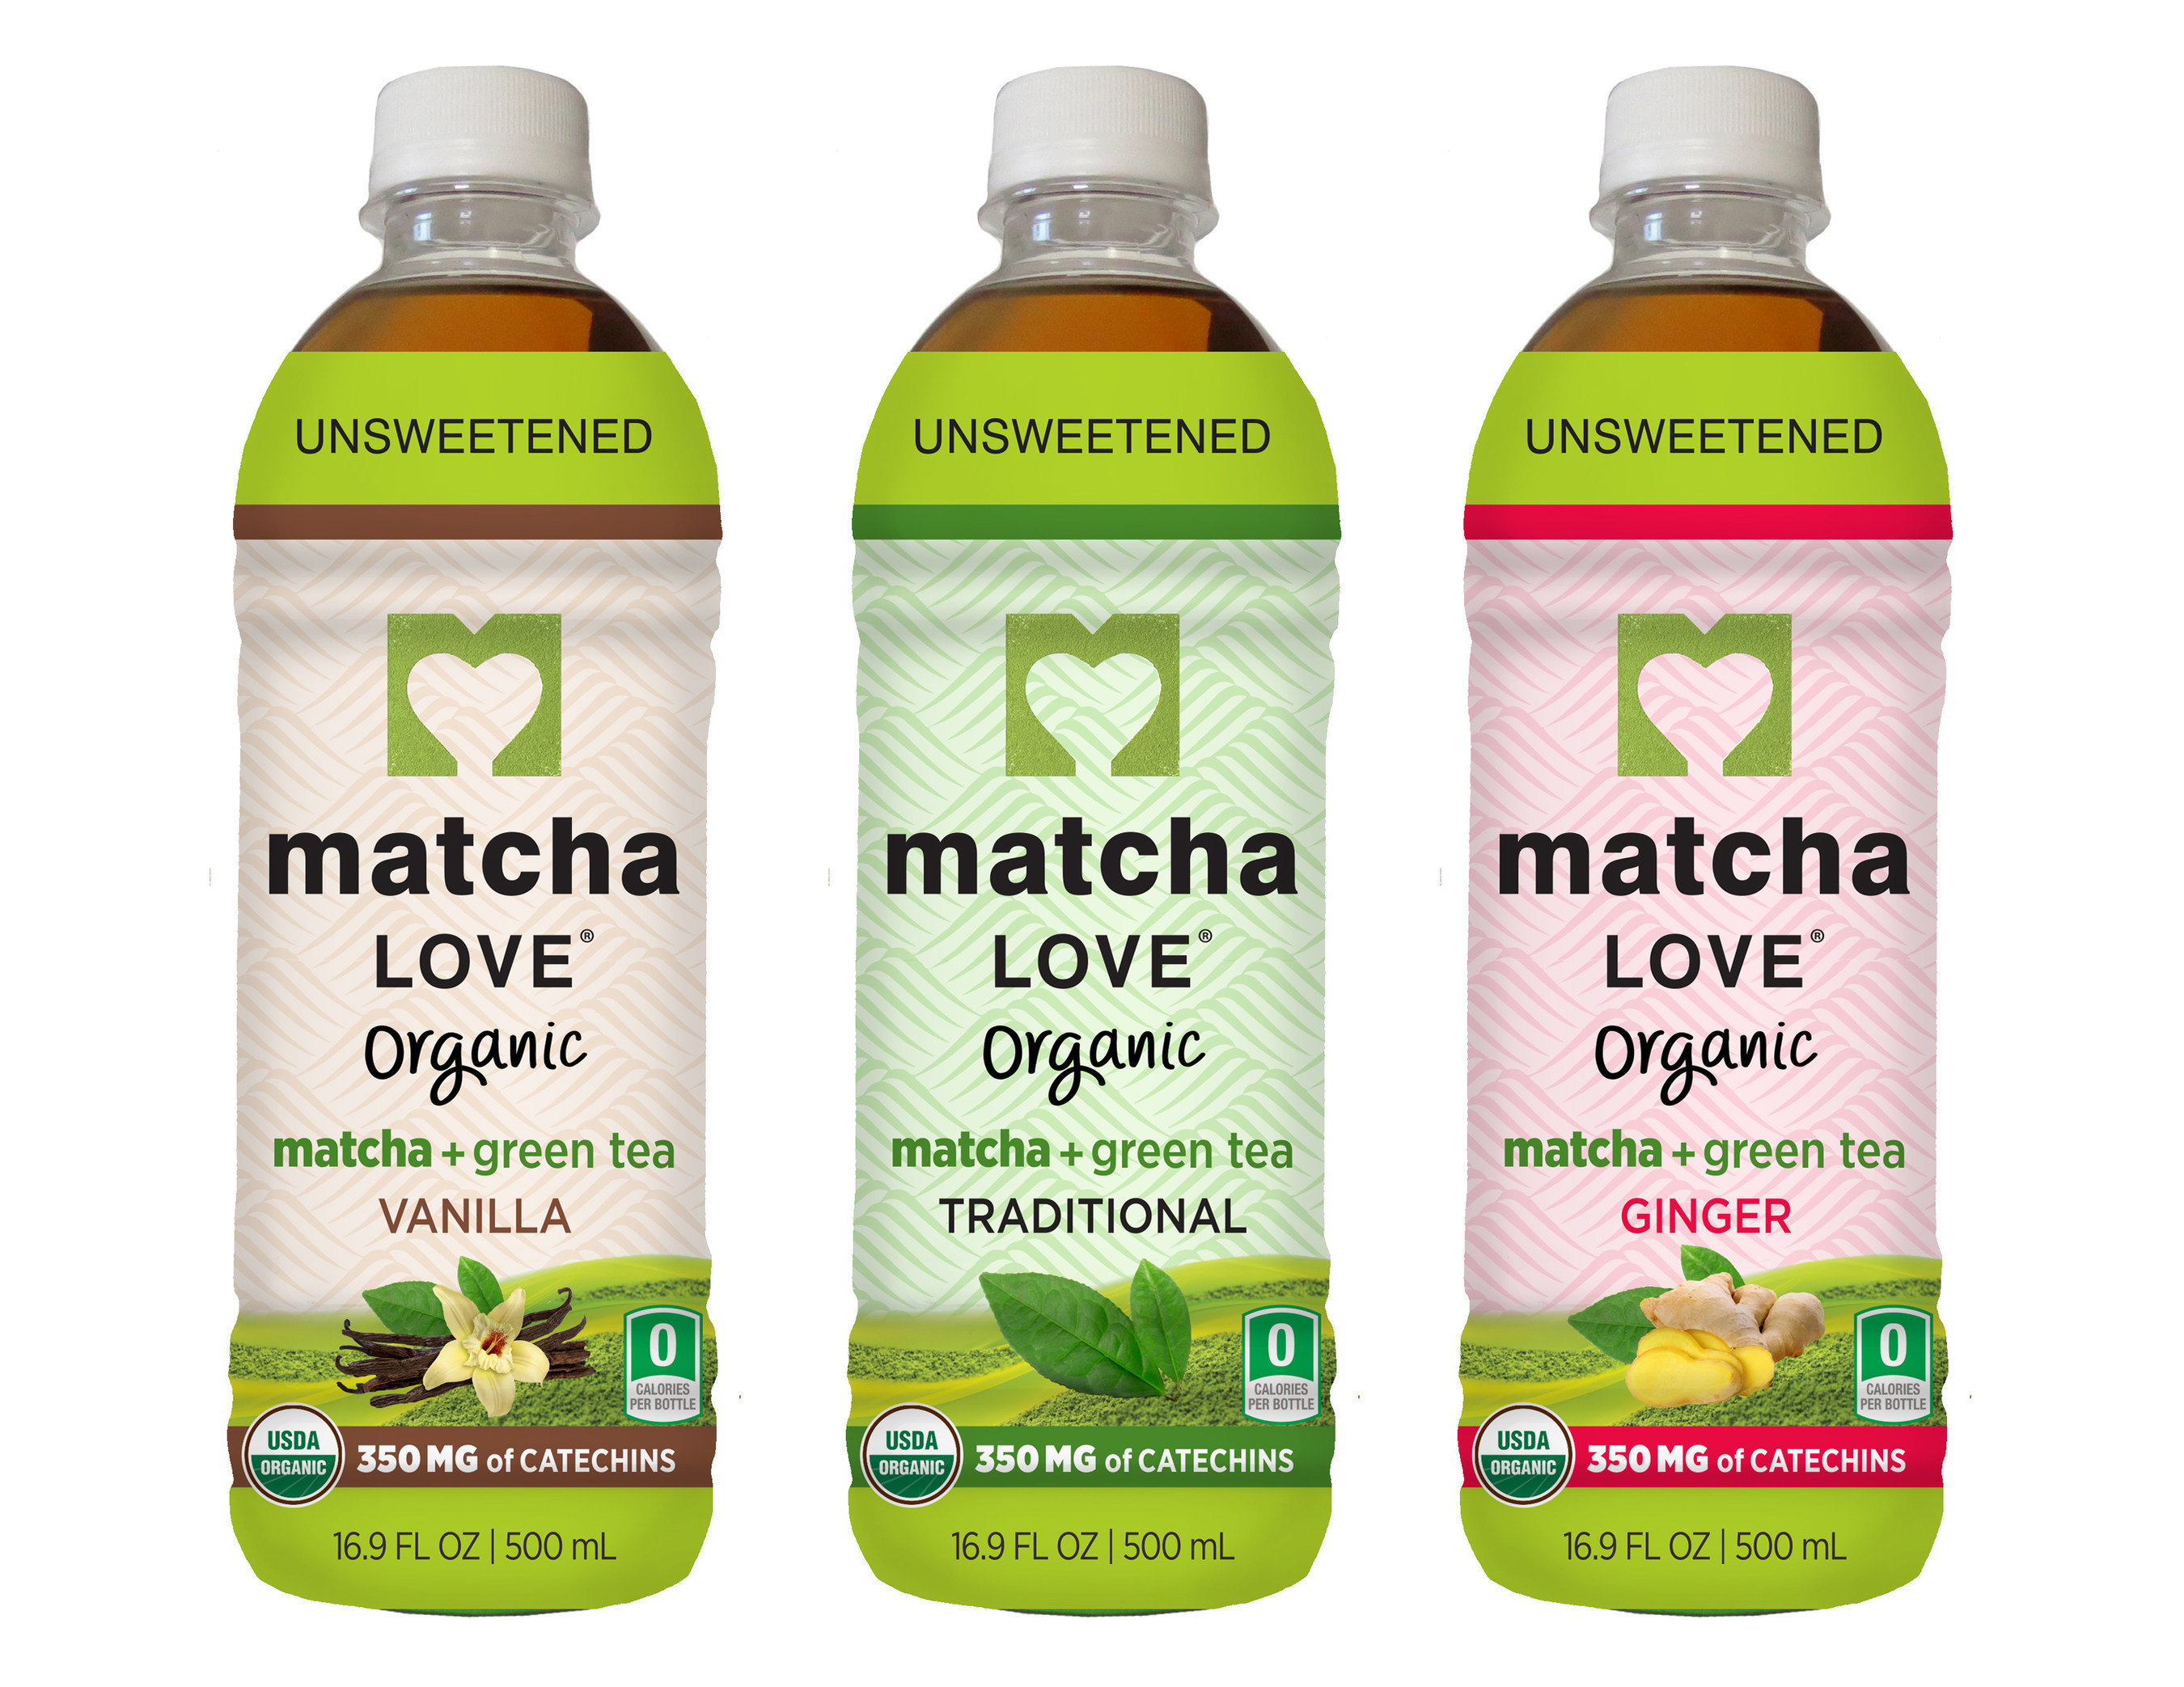 Matcha LOVE Organic Teas- Matcha Goodness in a Bottle